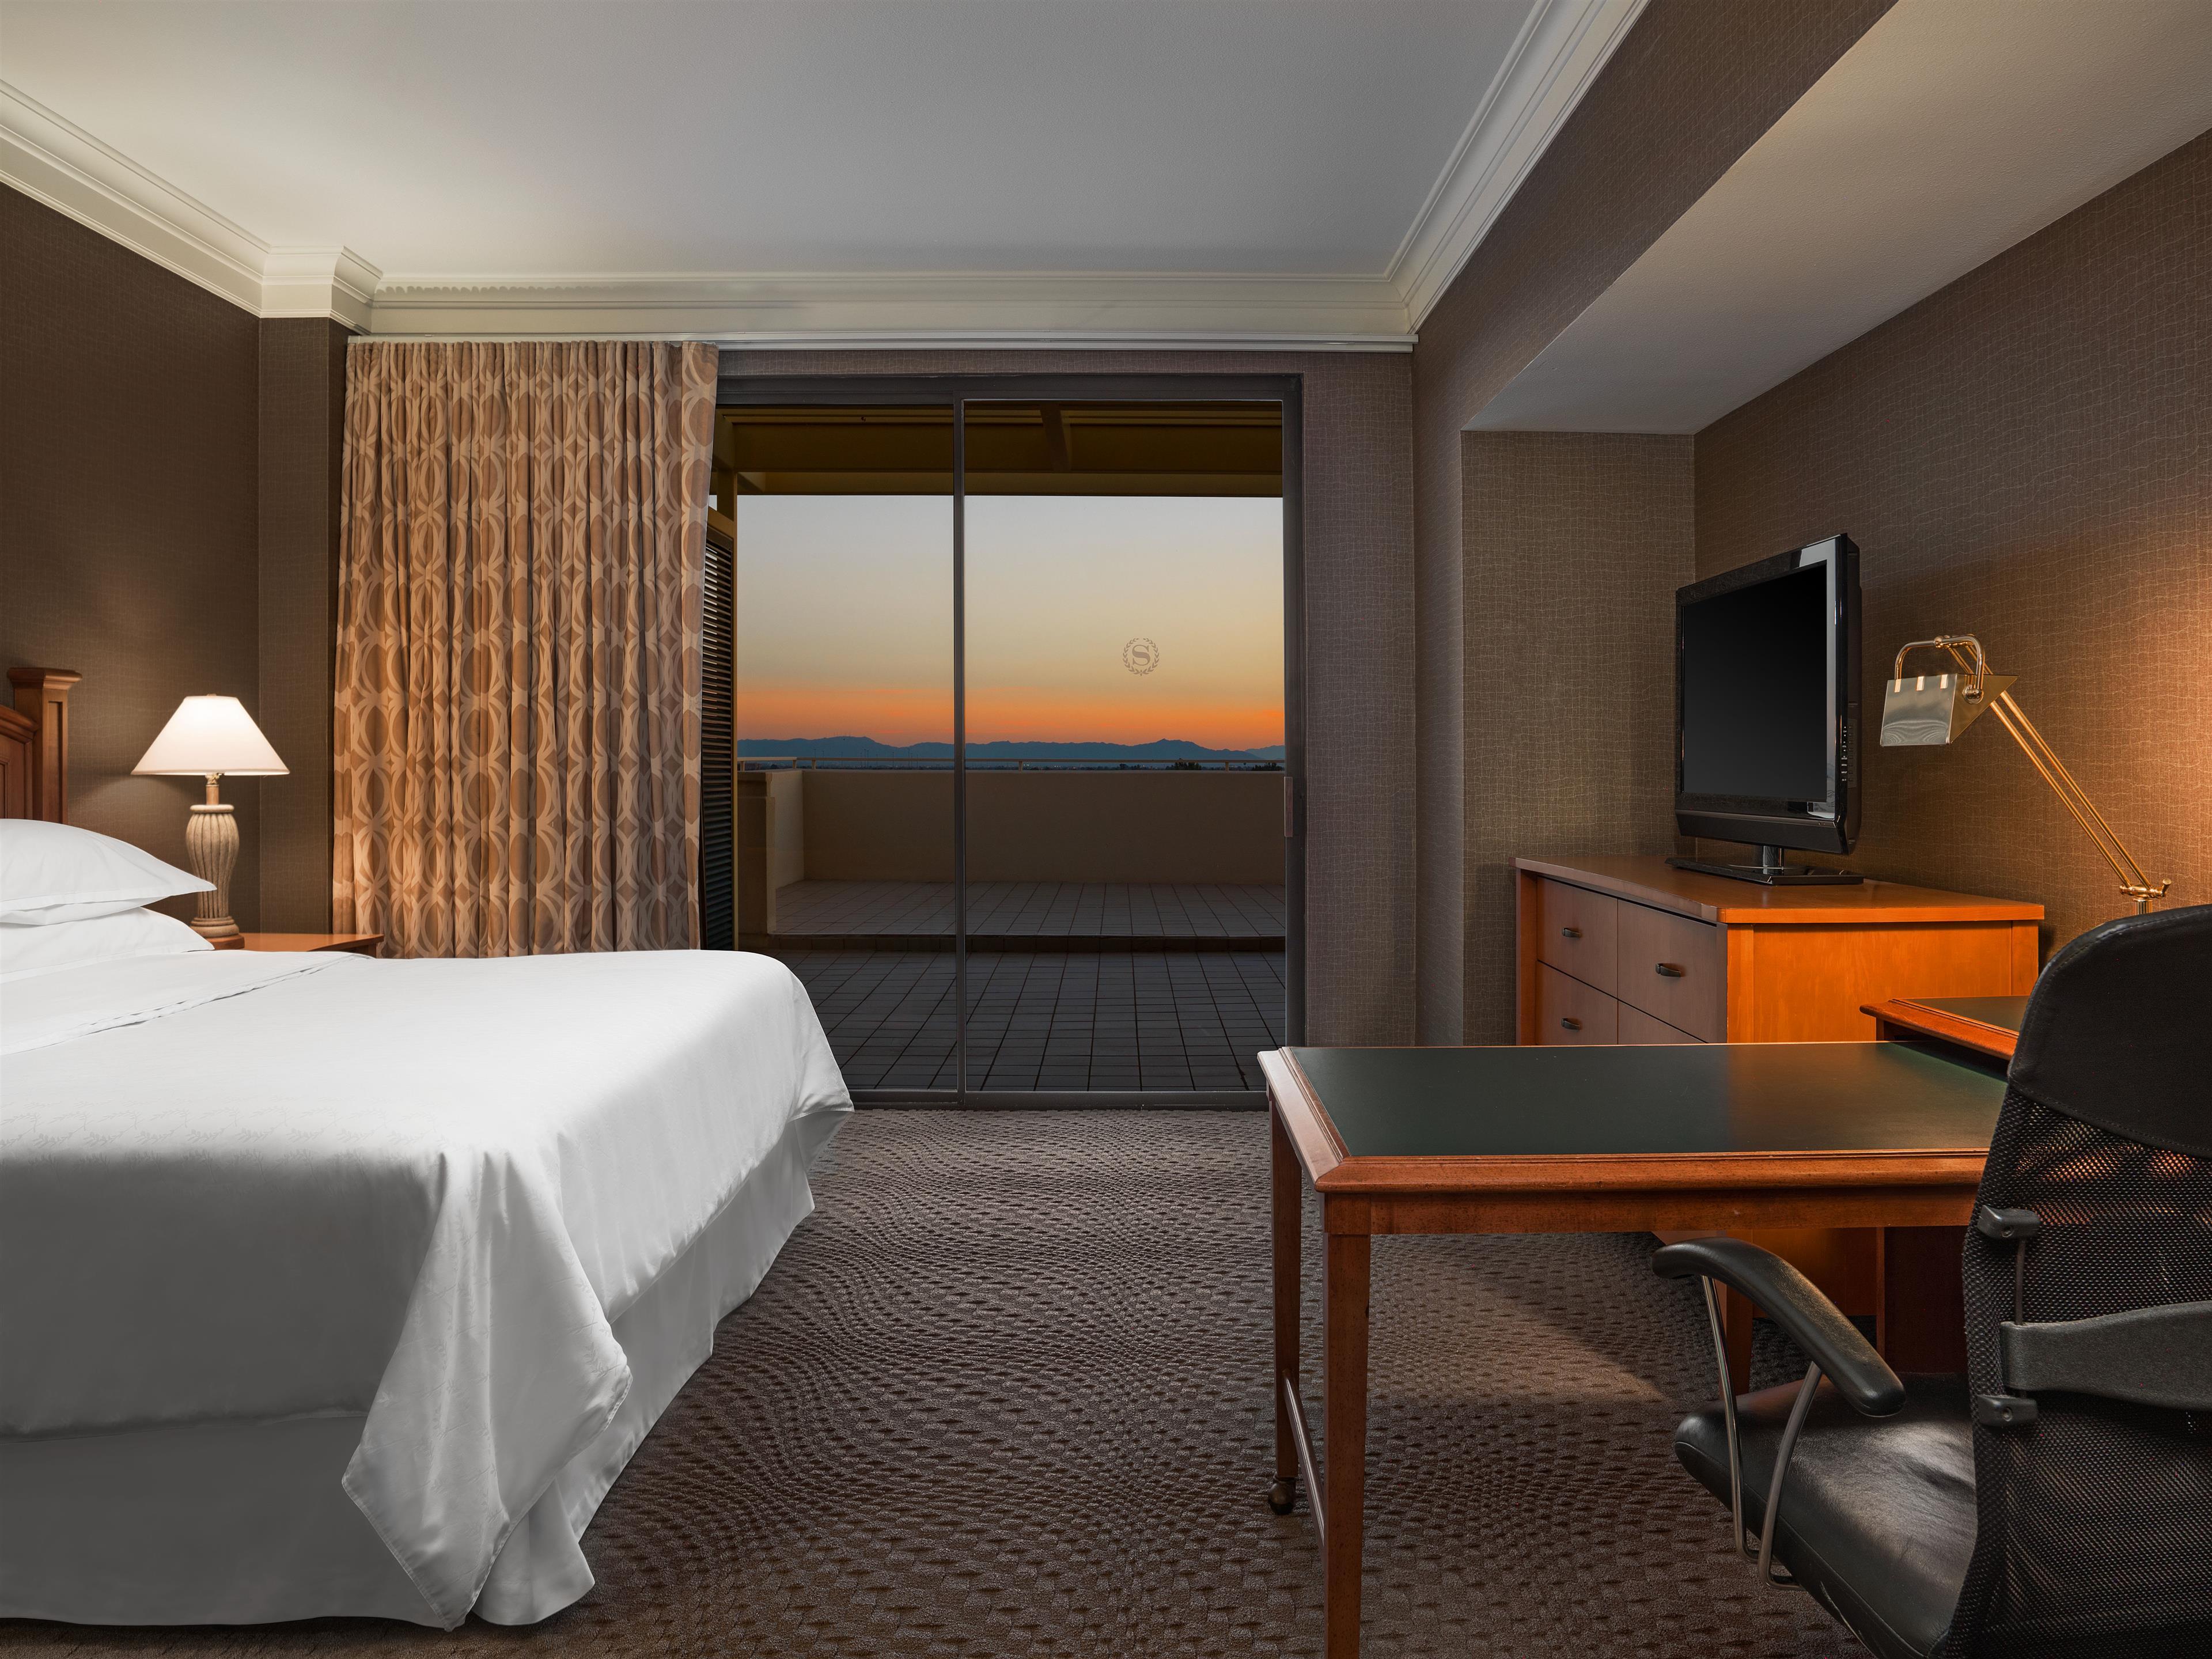 Sheraton Crescent Hotel image 4